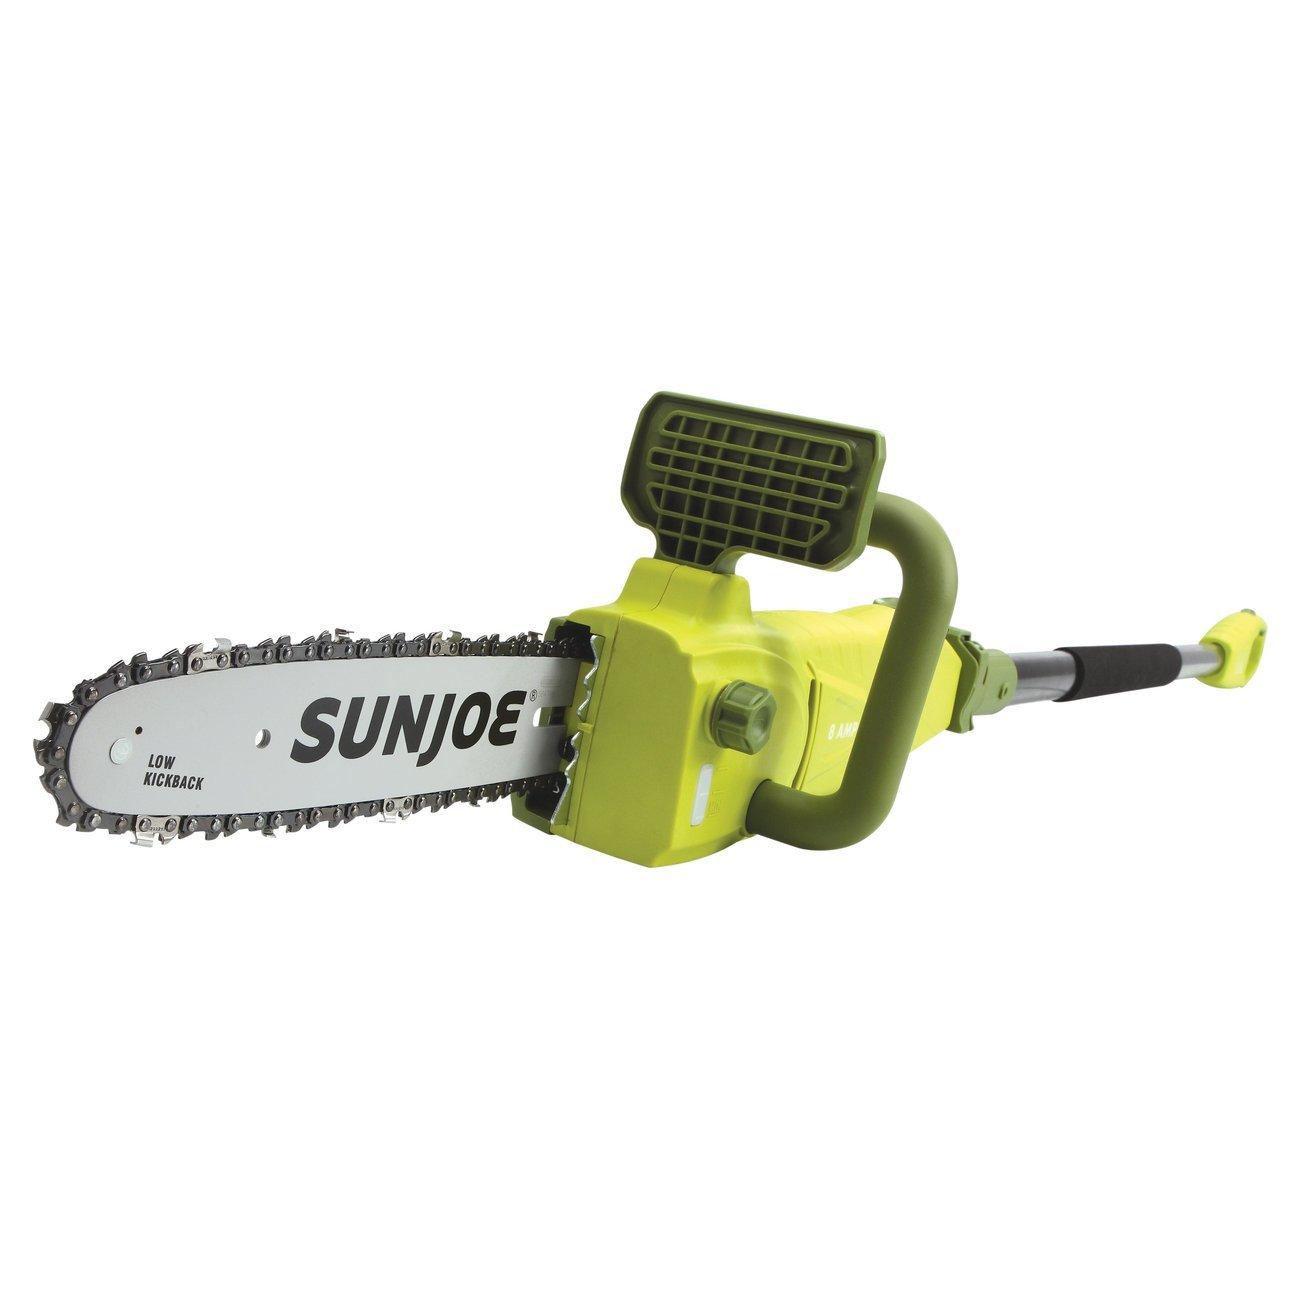 Sun Joe SWJ807E-SJG-RM Electric Convertible Pole Chain Saw   10 inch   8.0 Amp (Renewed)